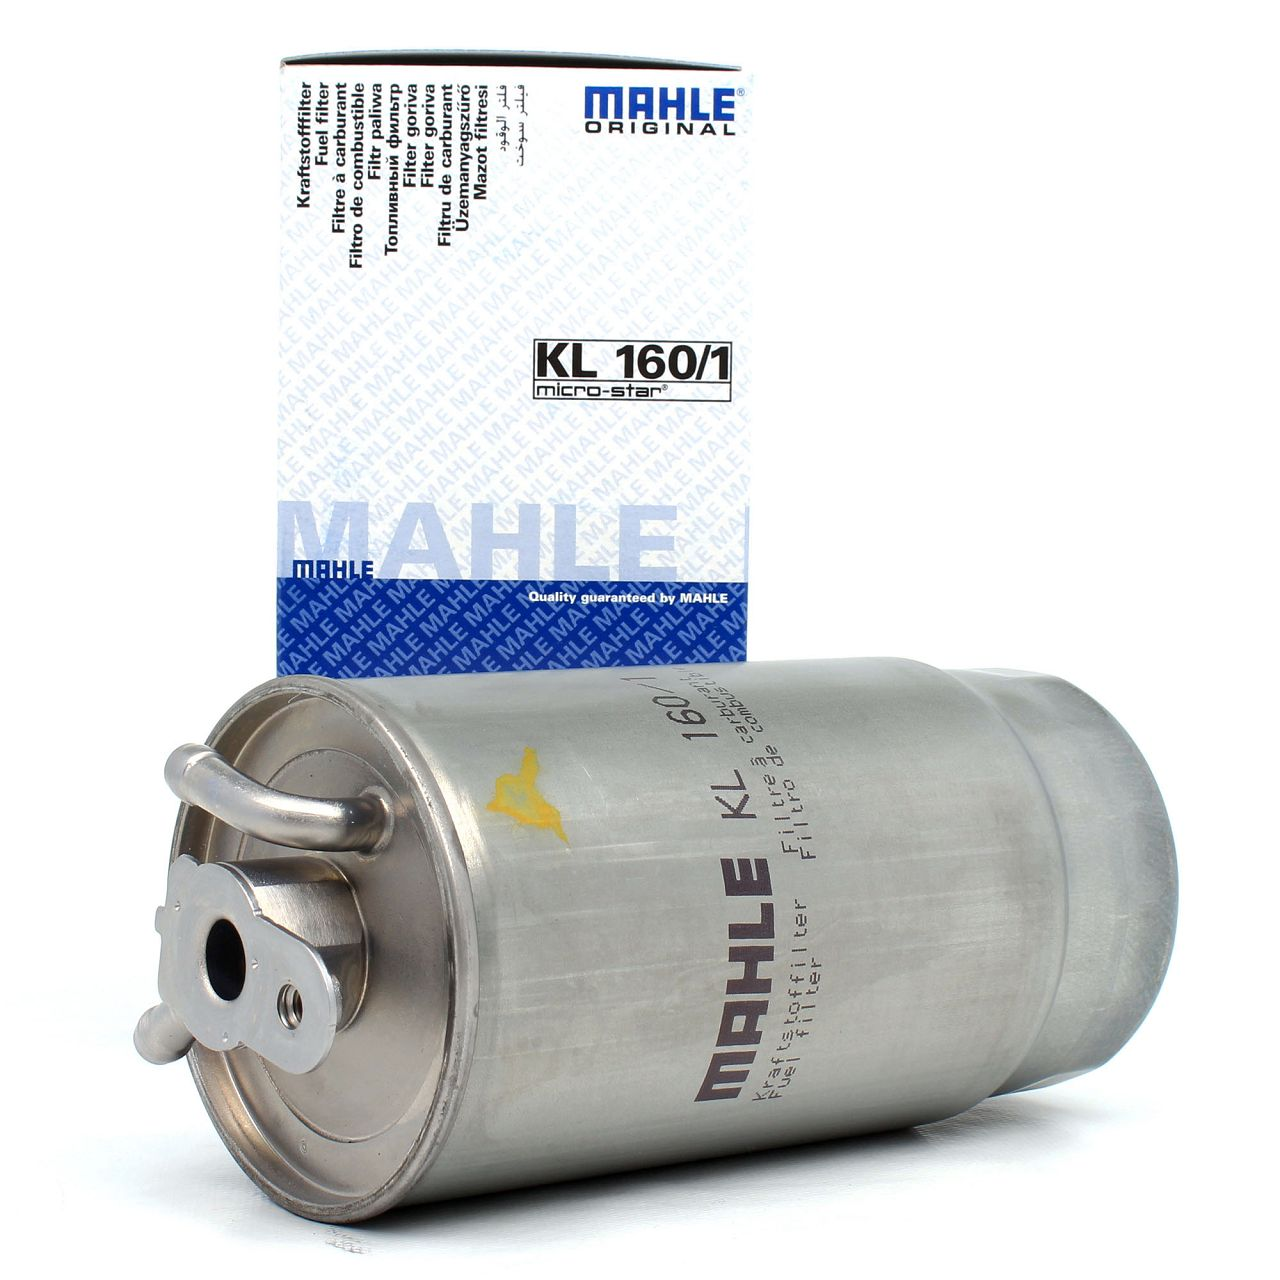 MAHLE Kraftstofffilter Dieselfilter KL160/1 BMW E46 330d / 5er E39 520-530d / X5